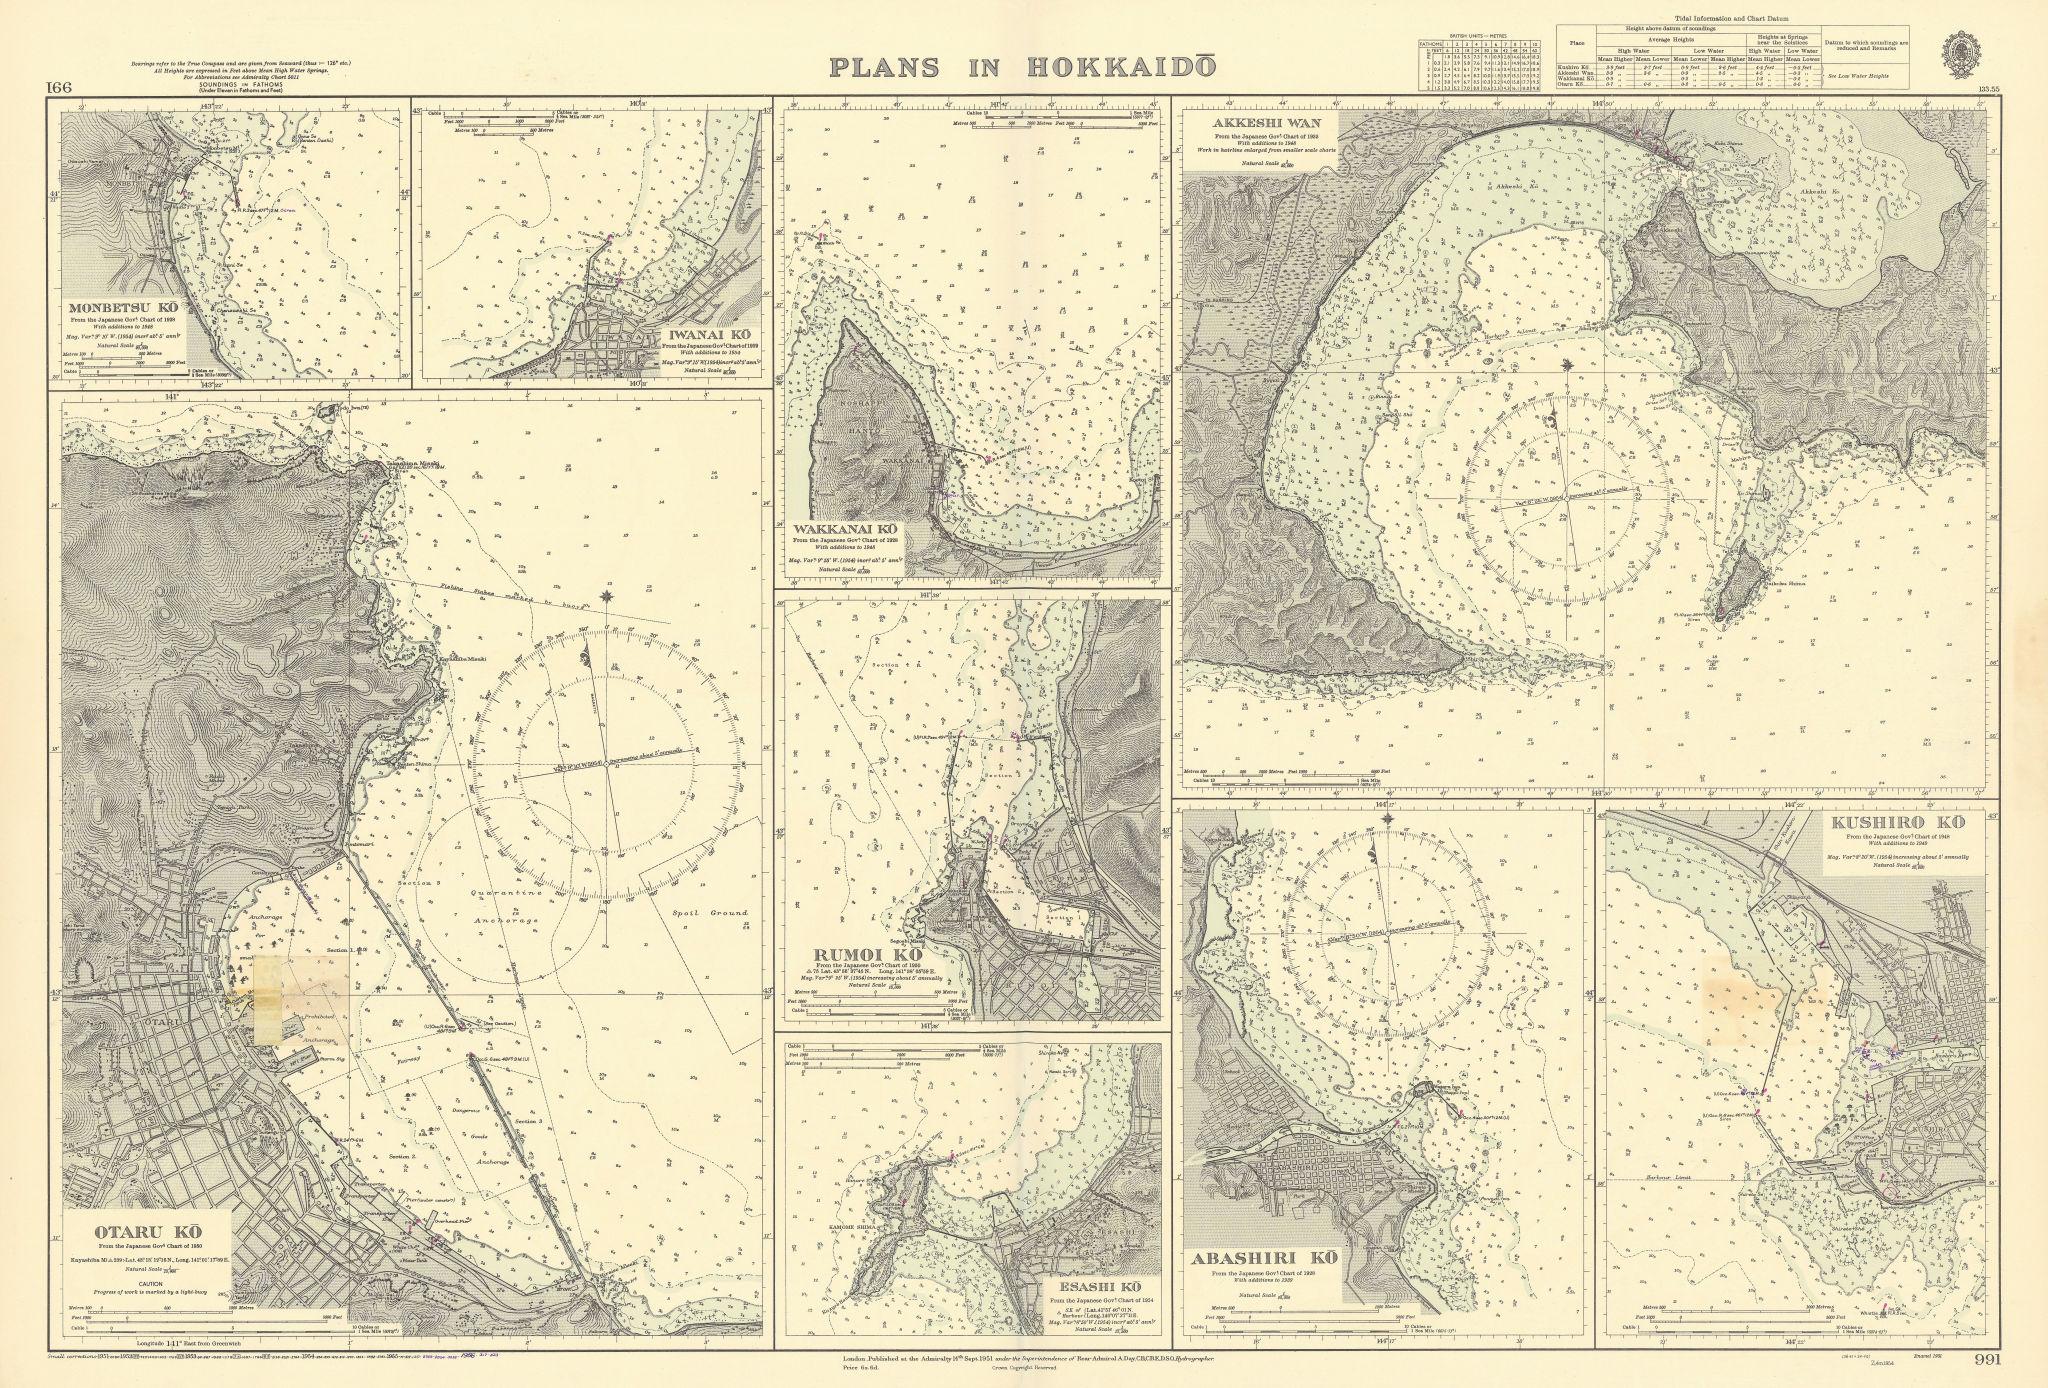 Hokkaido harbours Otaru Ko Akkeshi Wan Japan ADMIRALTY sea chart 1951 (1956) map